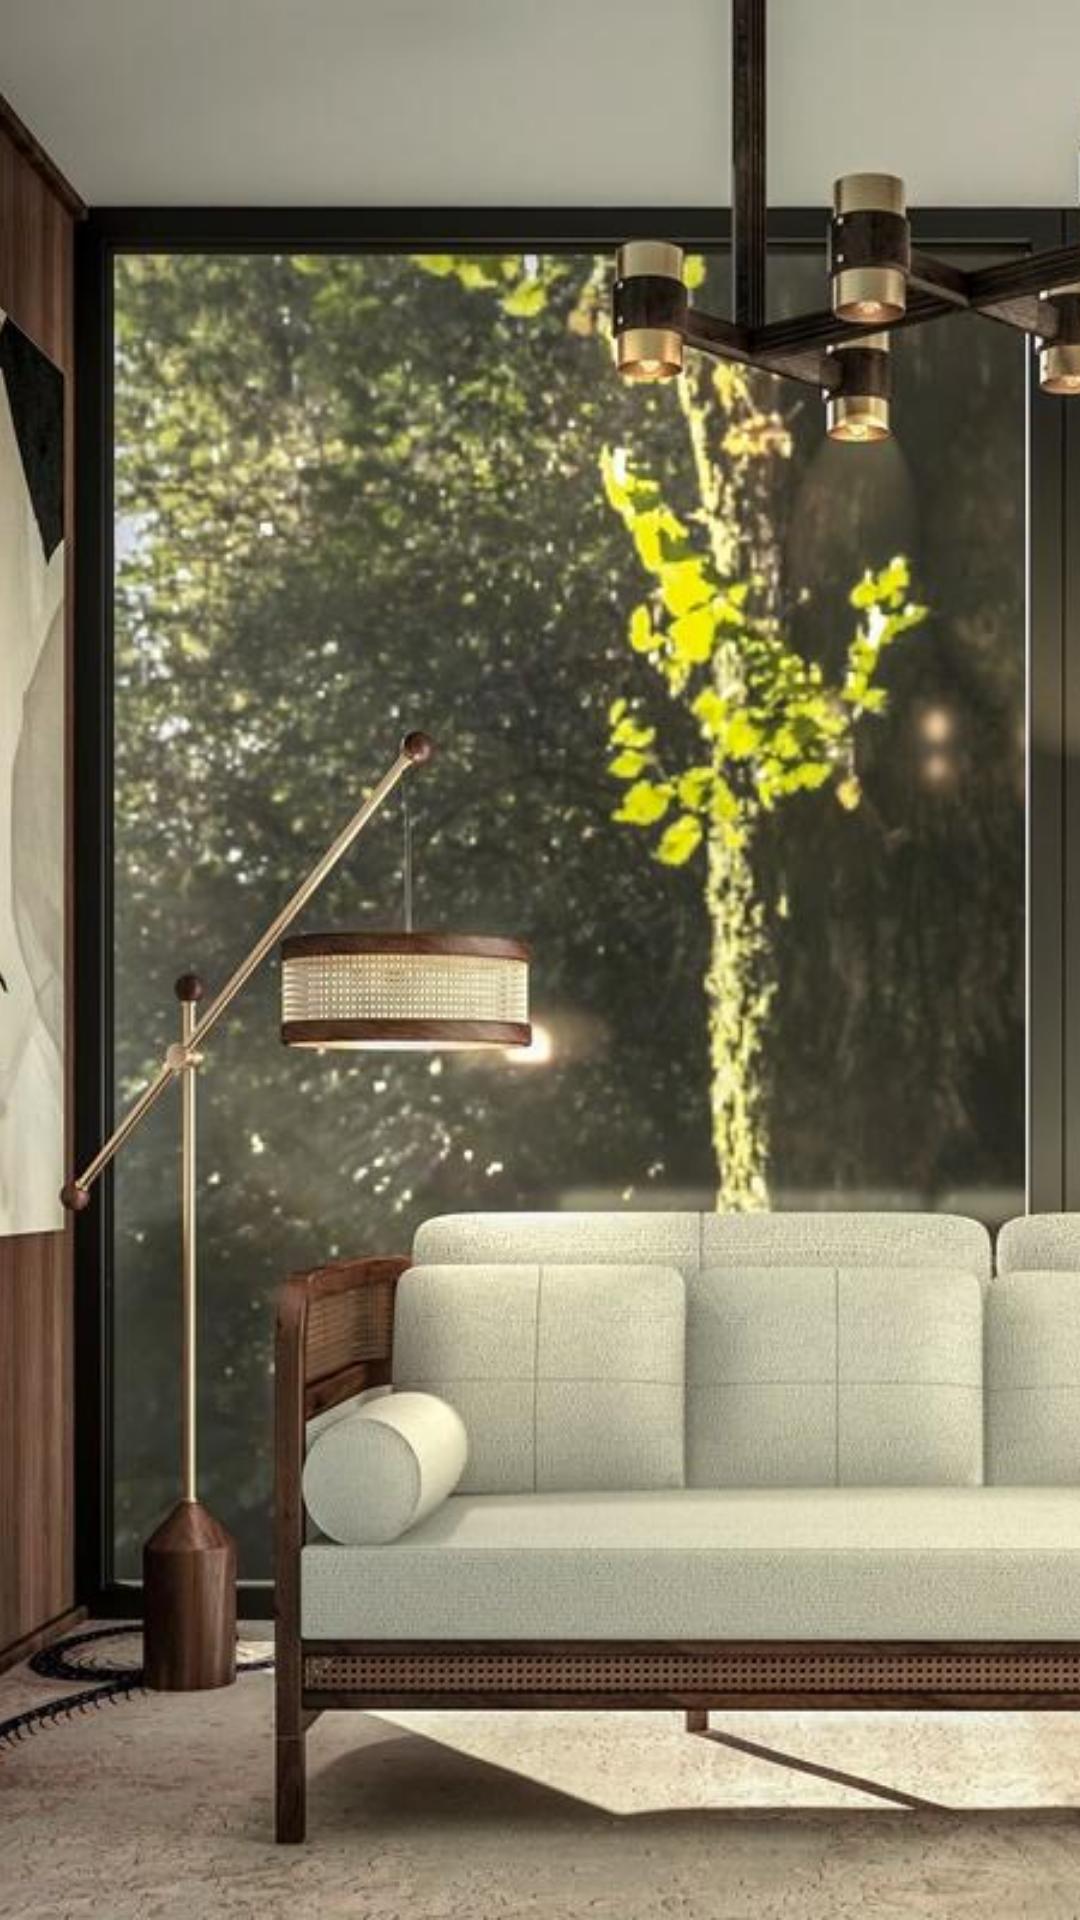 Wood Sofa Living Room Decor Furniture Design Wood Settee Sofa Ideas Rattan Details In 2020 Trending Decor Wooden Sofa Living Room Design Inspiration #wooden #sofas #for #living #room